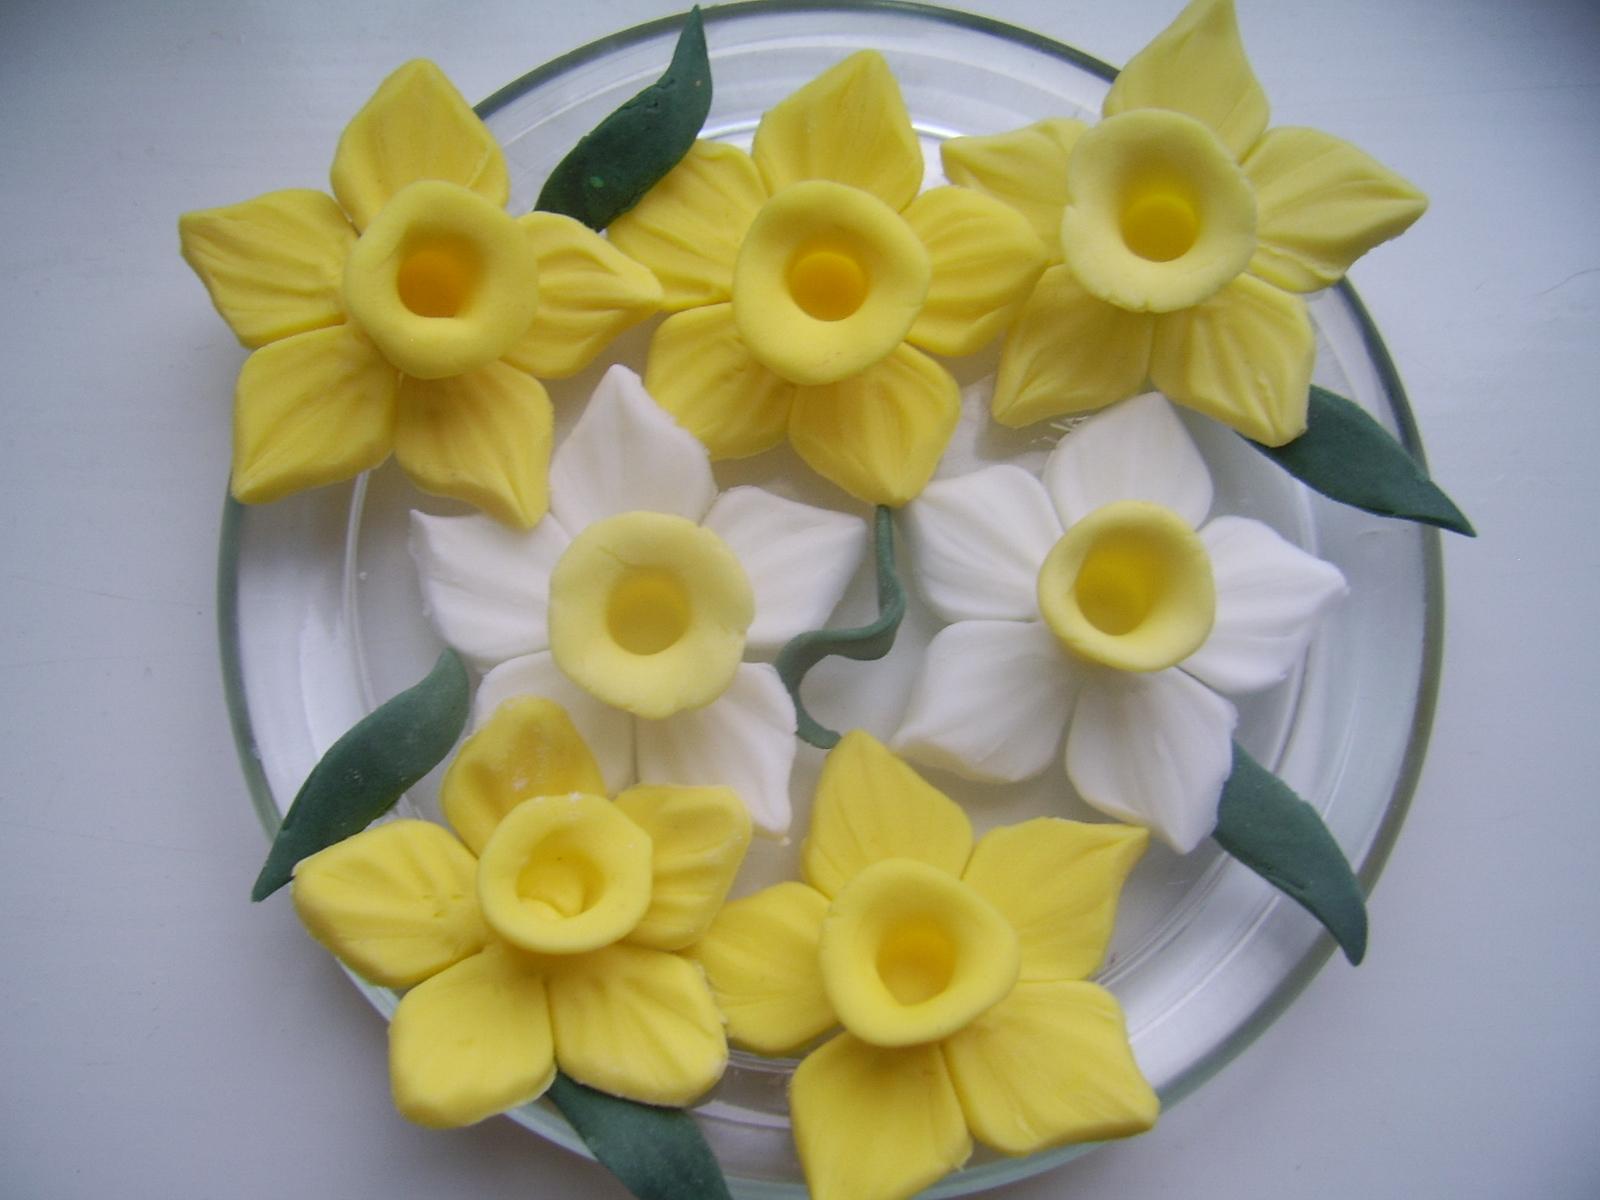 Irenafoods Fondant Icing Sugar Daffodils Narcise